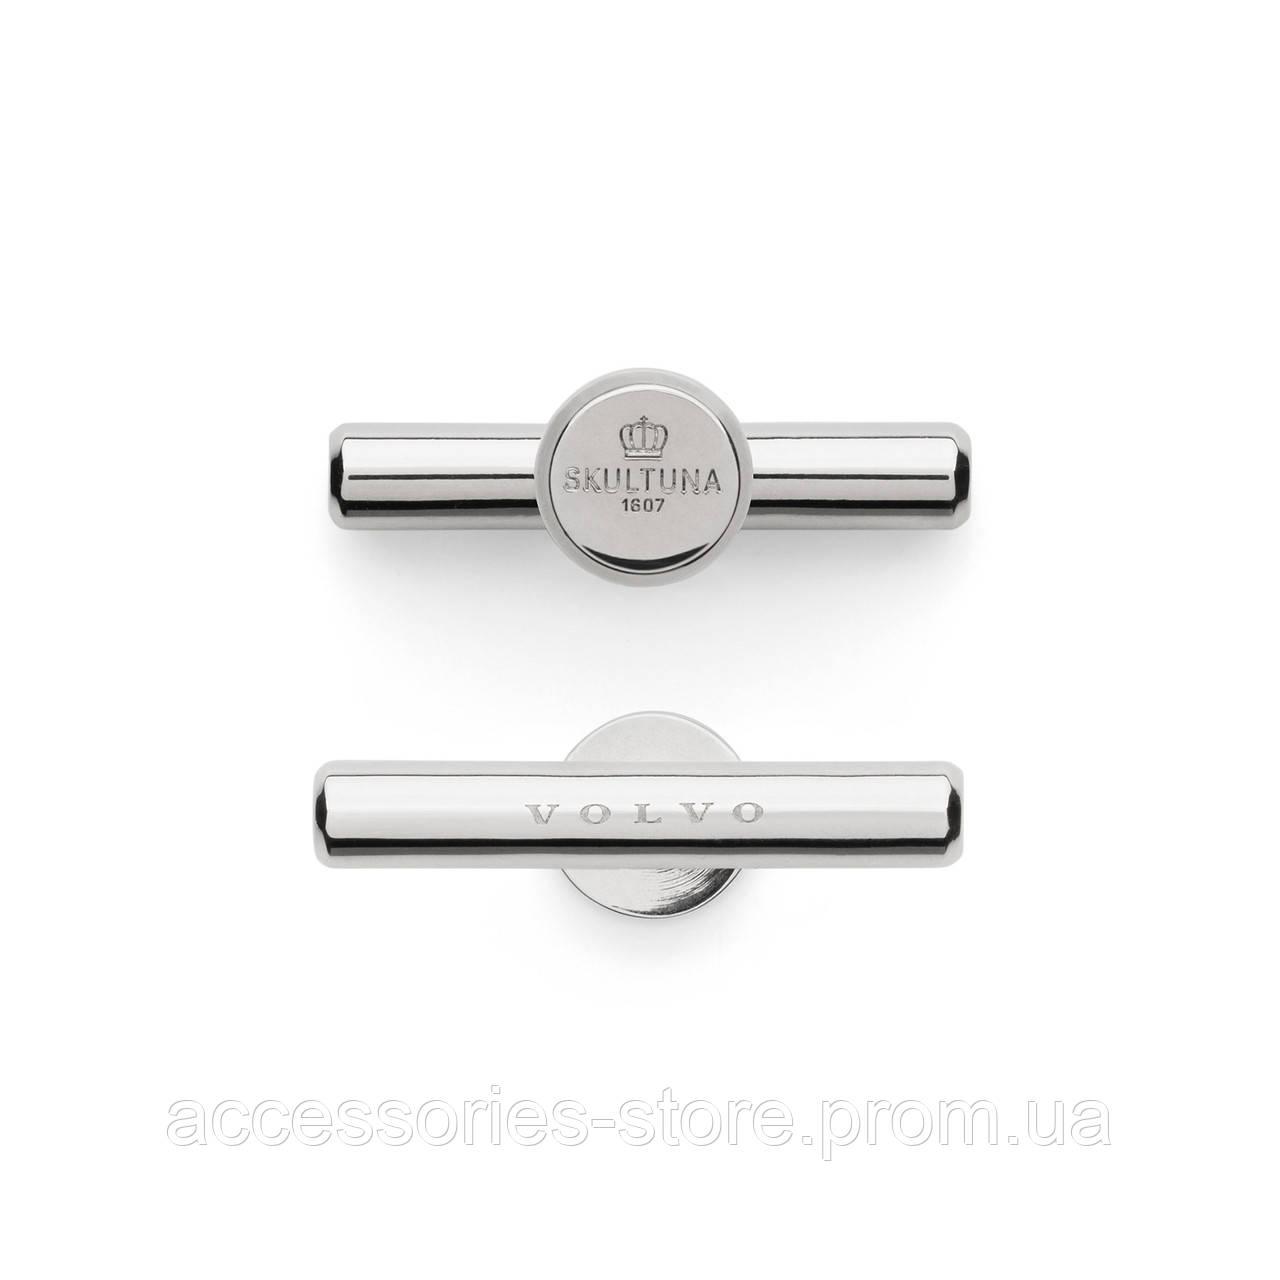 Запонки серебряные Volvo, silver by Skultuna